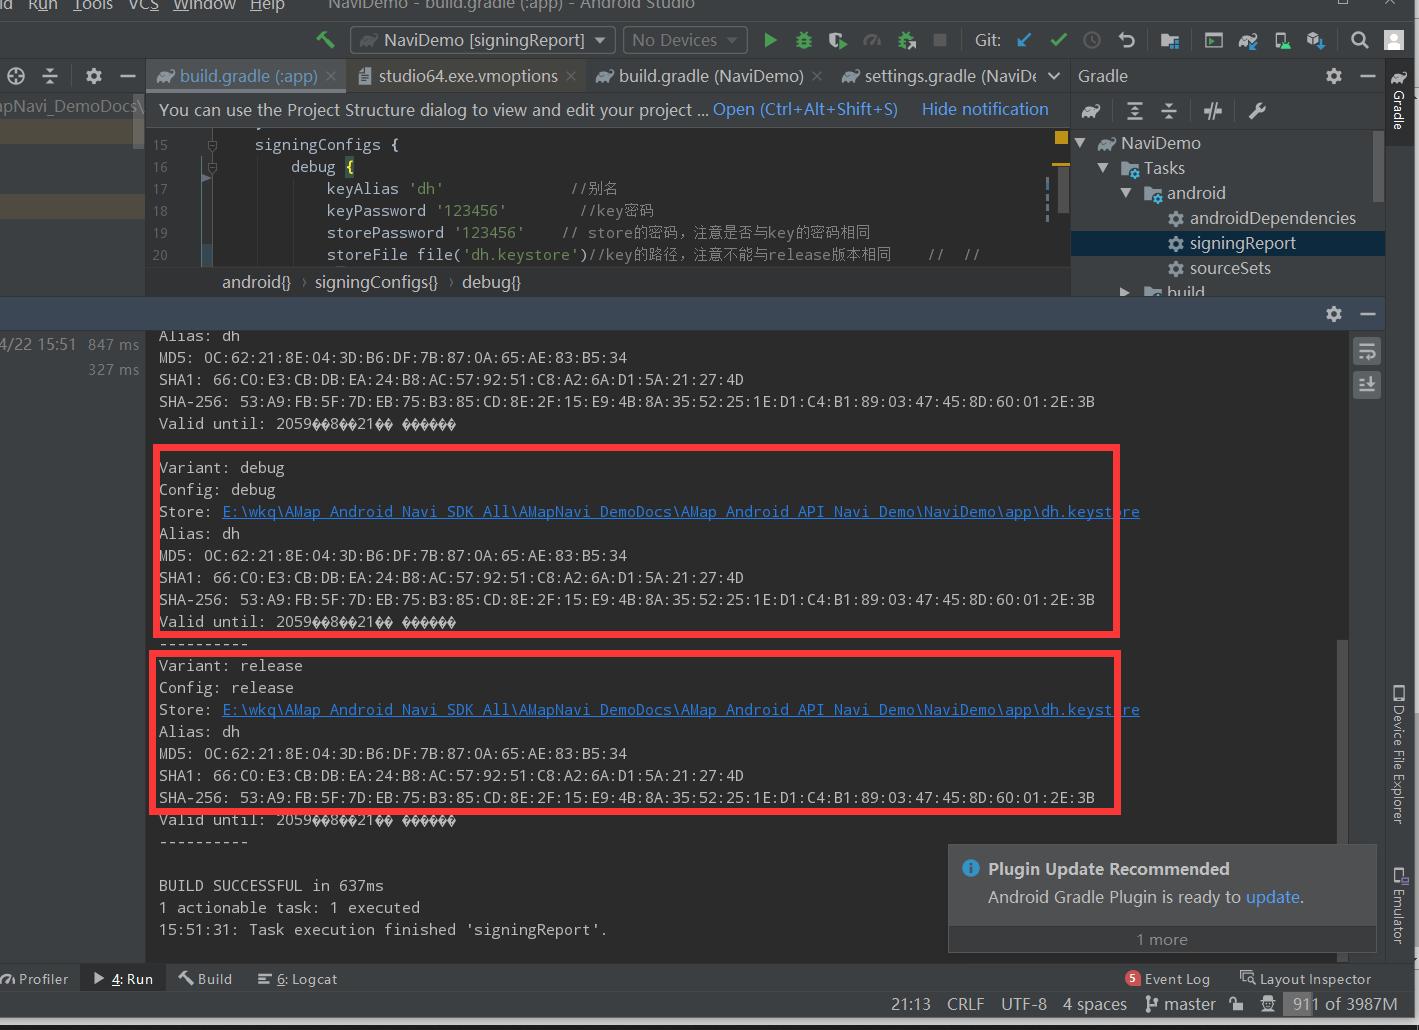 Android Studio 生成签名文件以及JKS 密钥库专用格式 PKCS12 适配